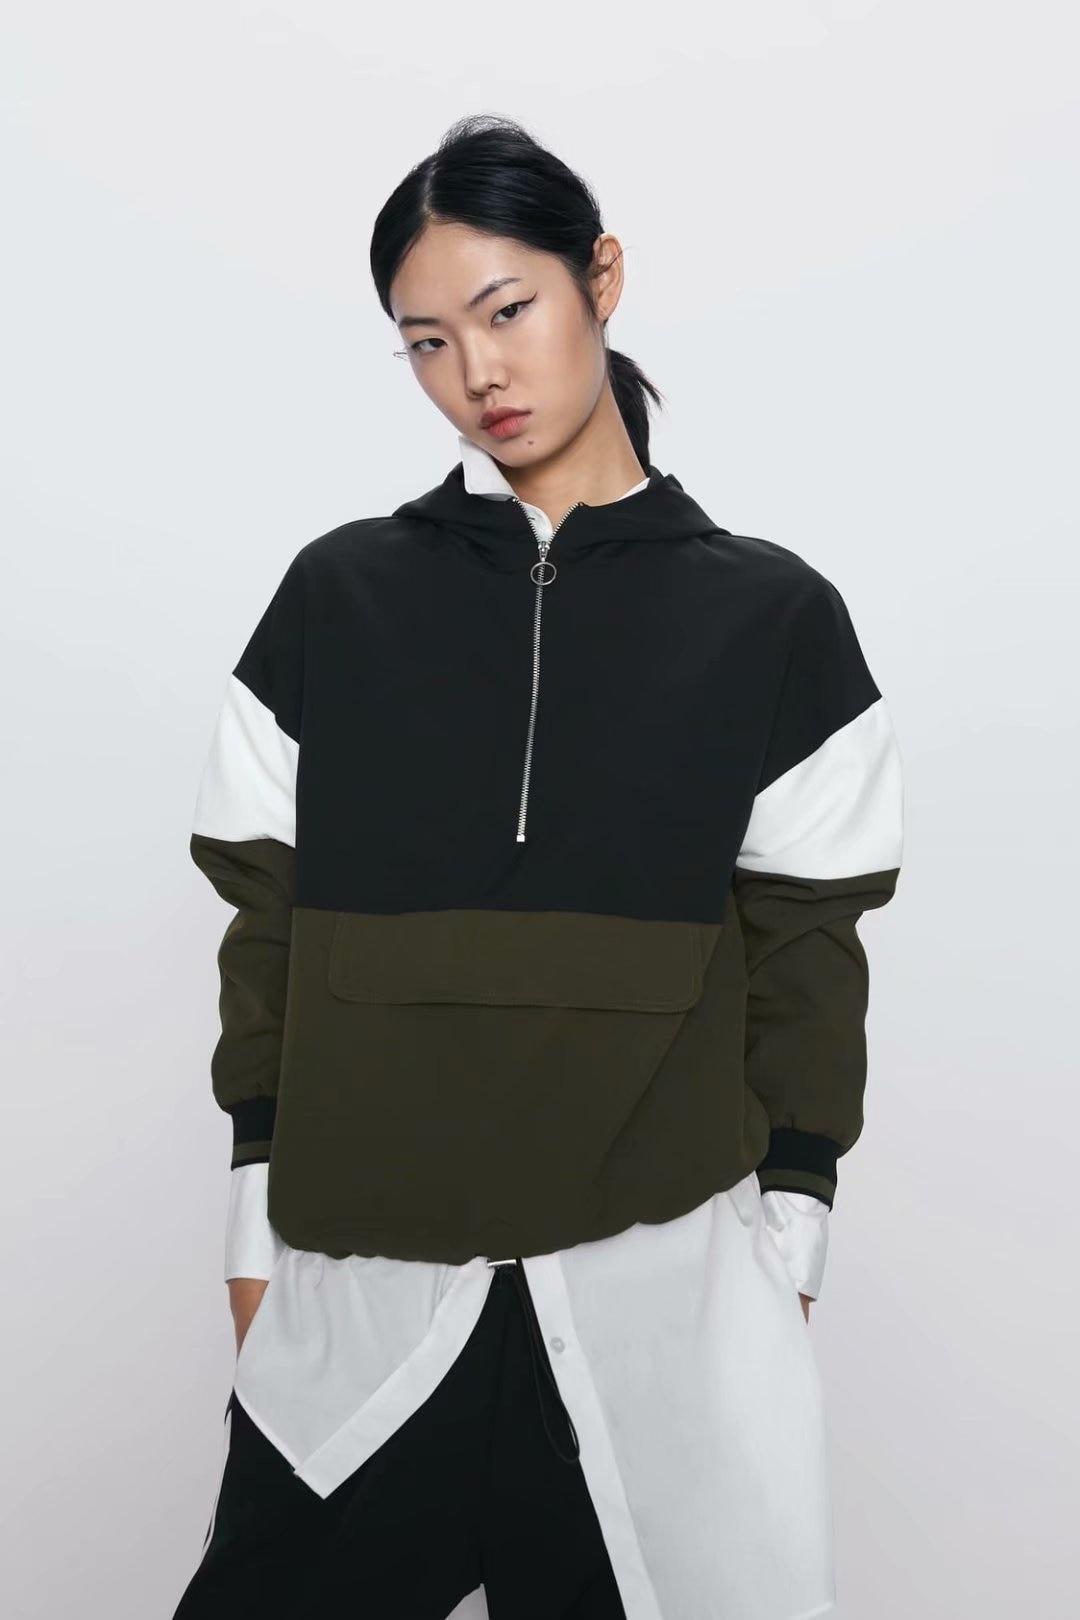 2020 New Spring Summer European Mixed Colors Zaraing Women Jacket Coat Hooded Pullover Vadiming Sheining Female Jacket HJY8818